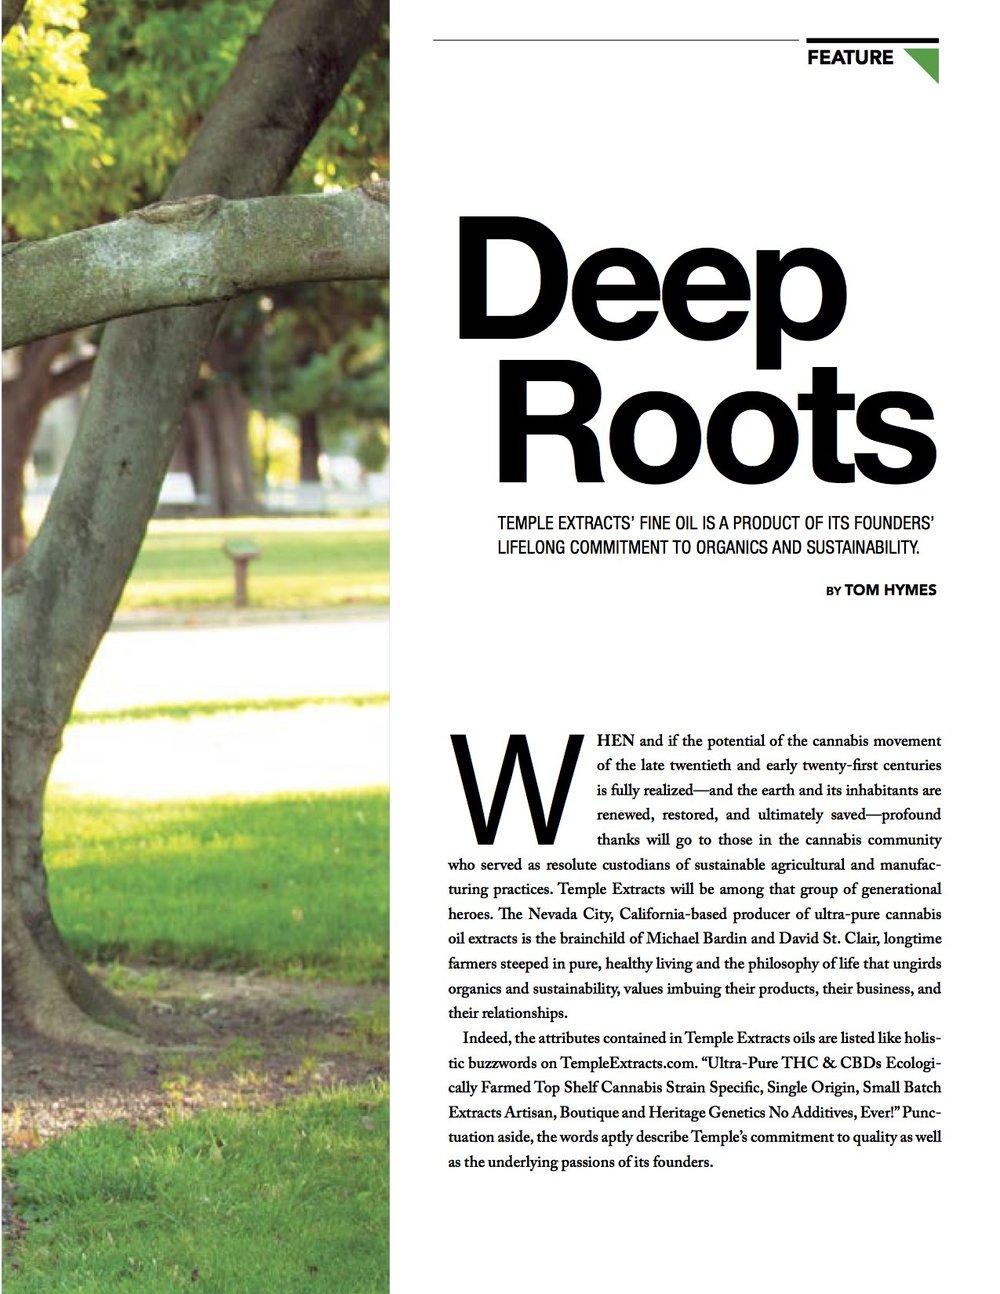 MG - Deep Roots Feature3.jpg